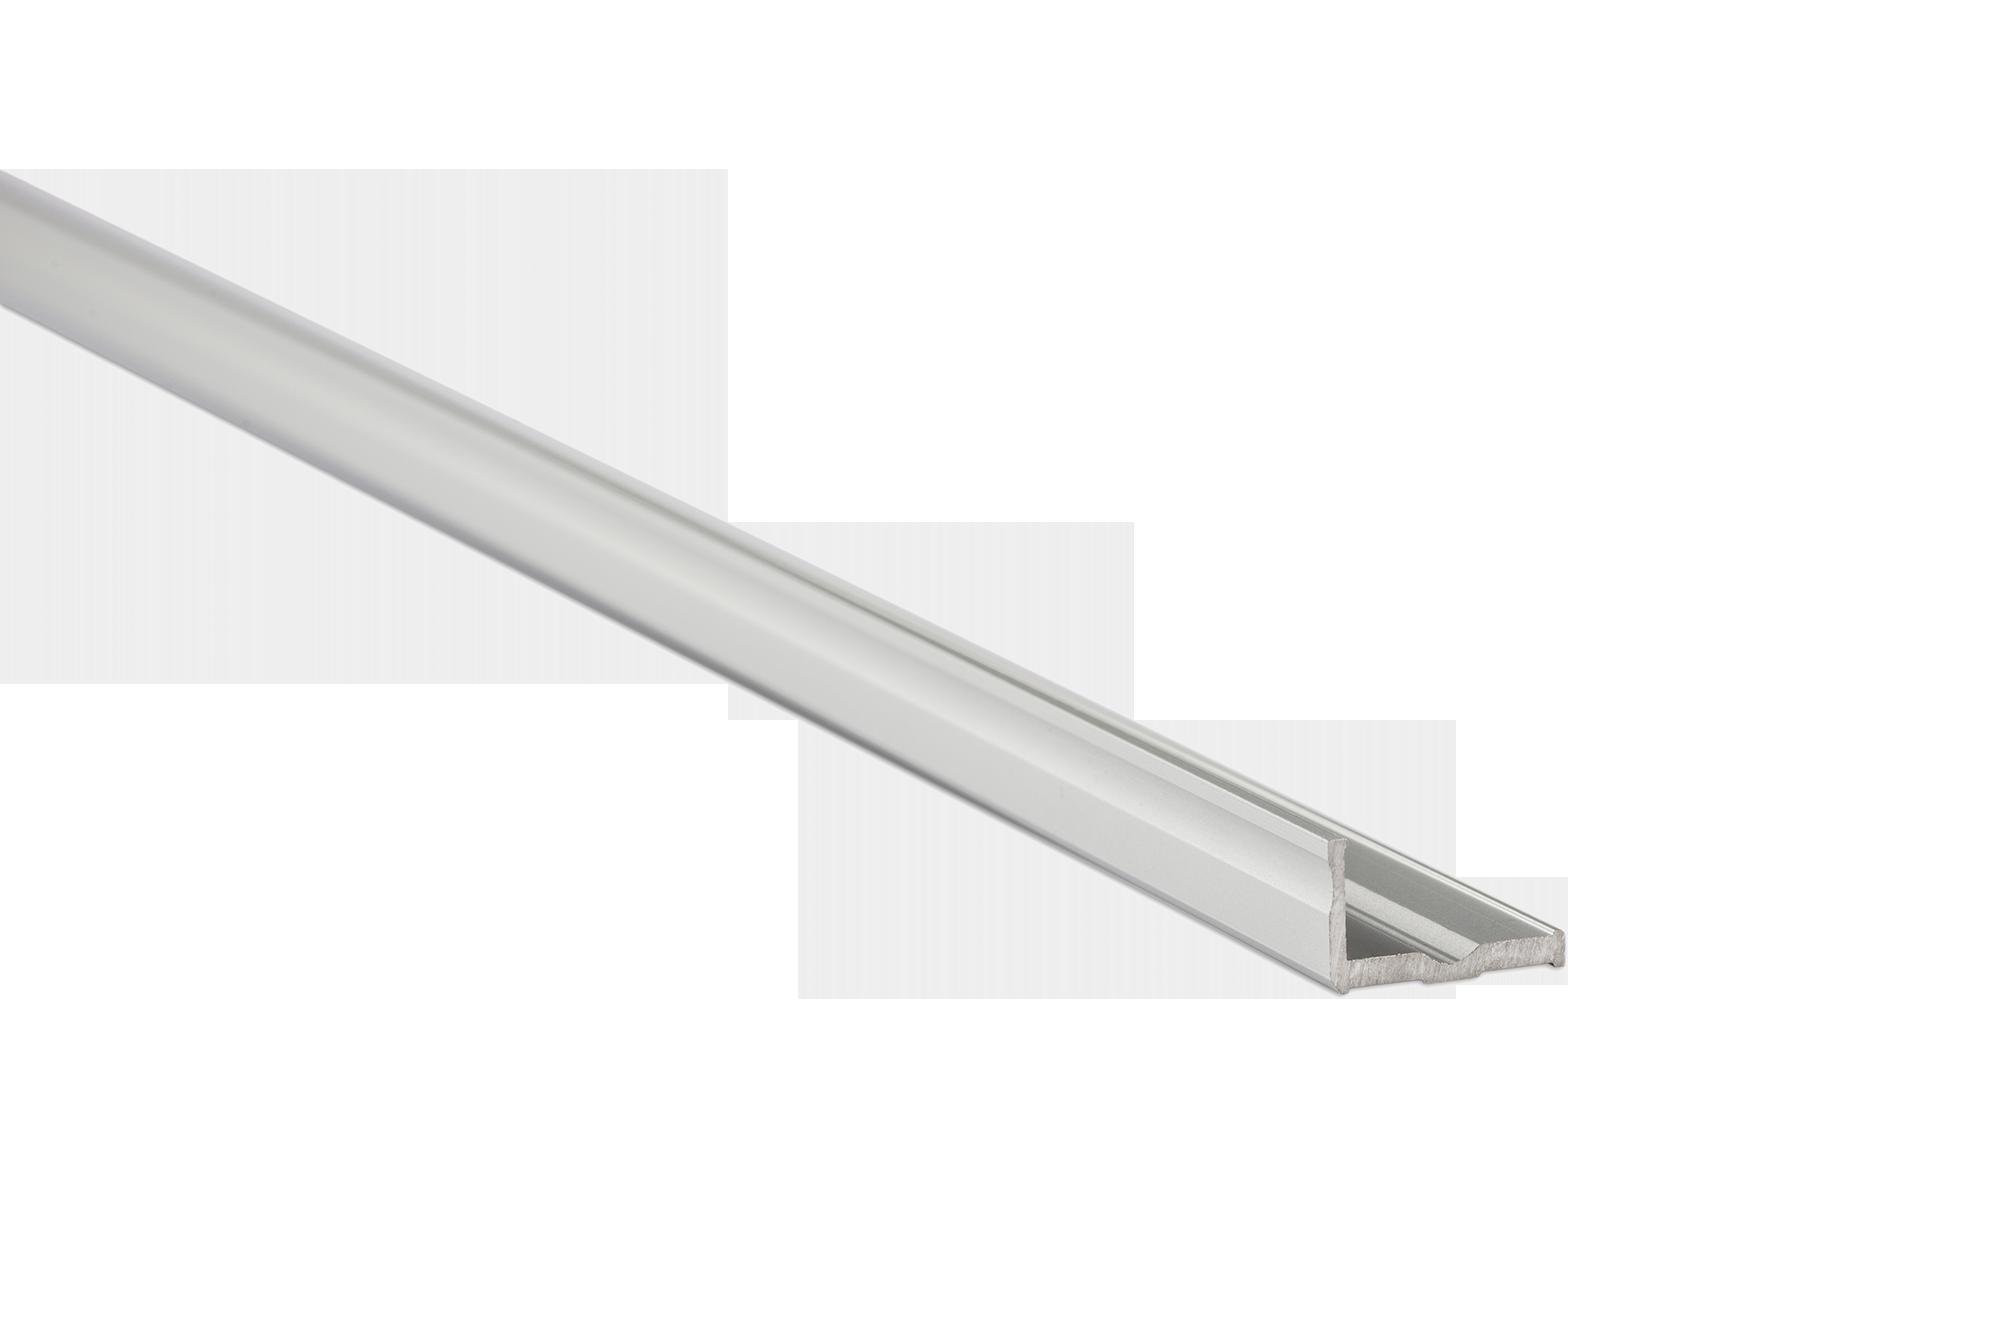 Type E Silver Anod Image